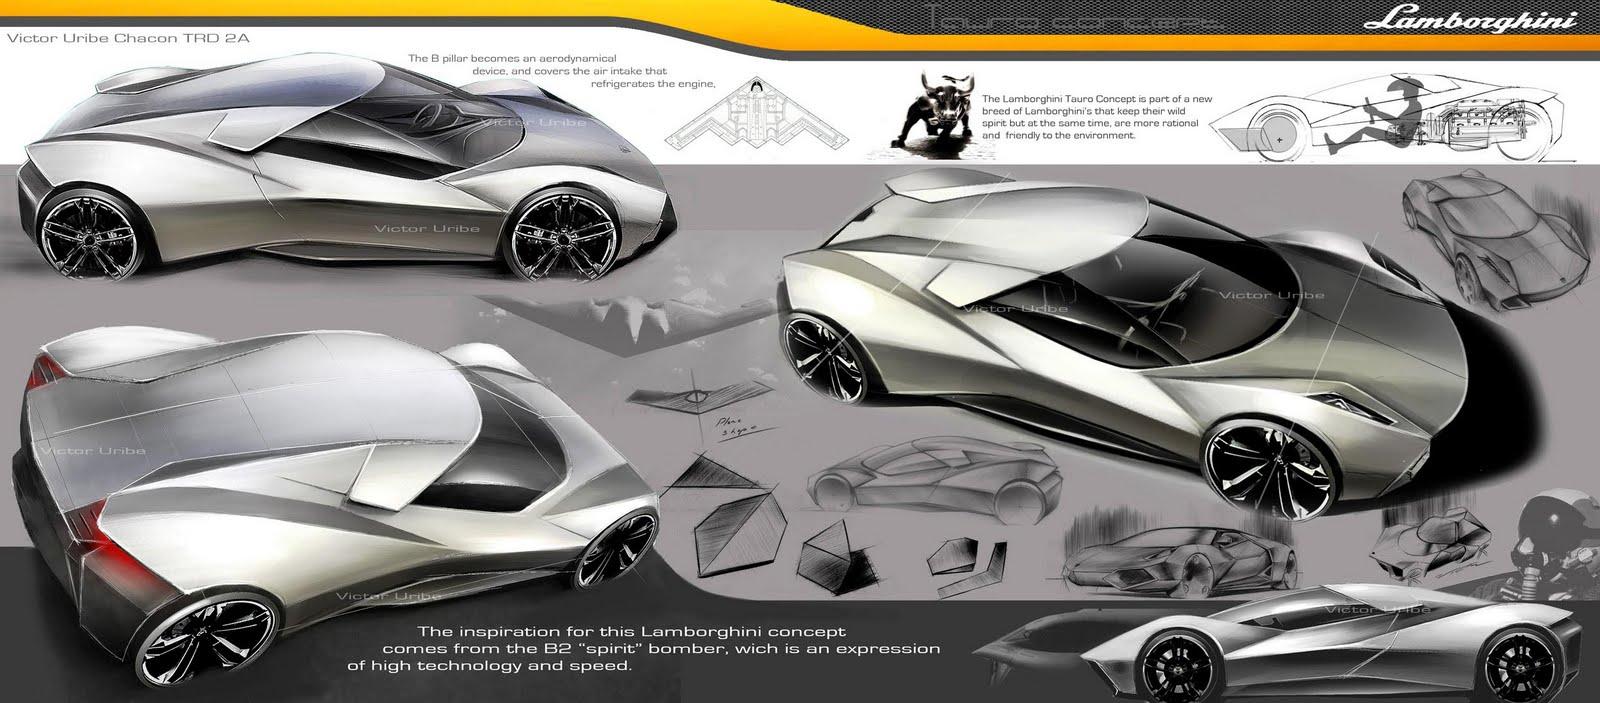 Car Design And My Life June 2010